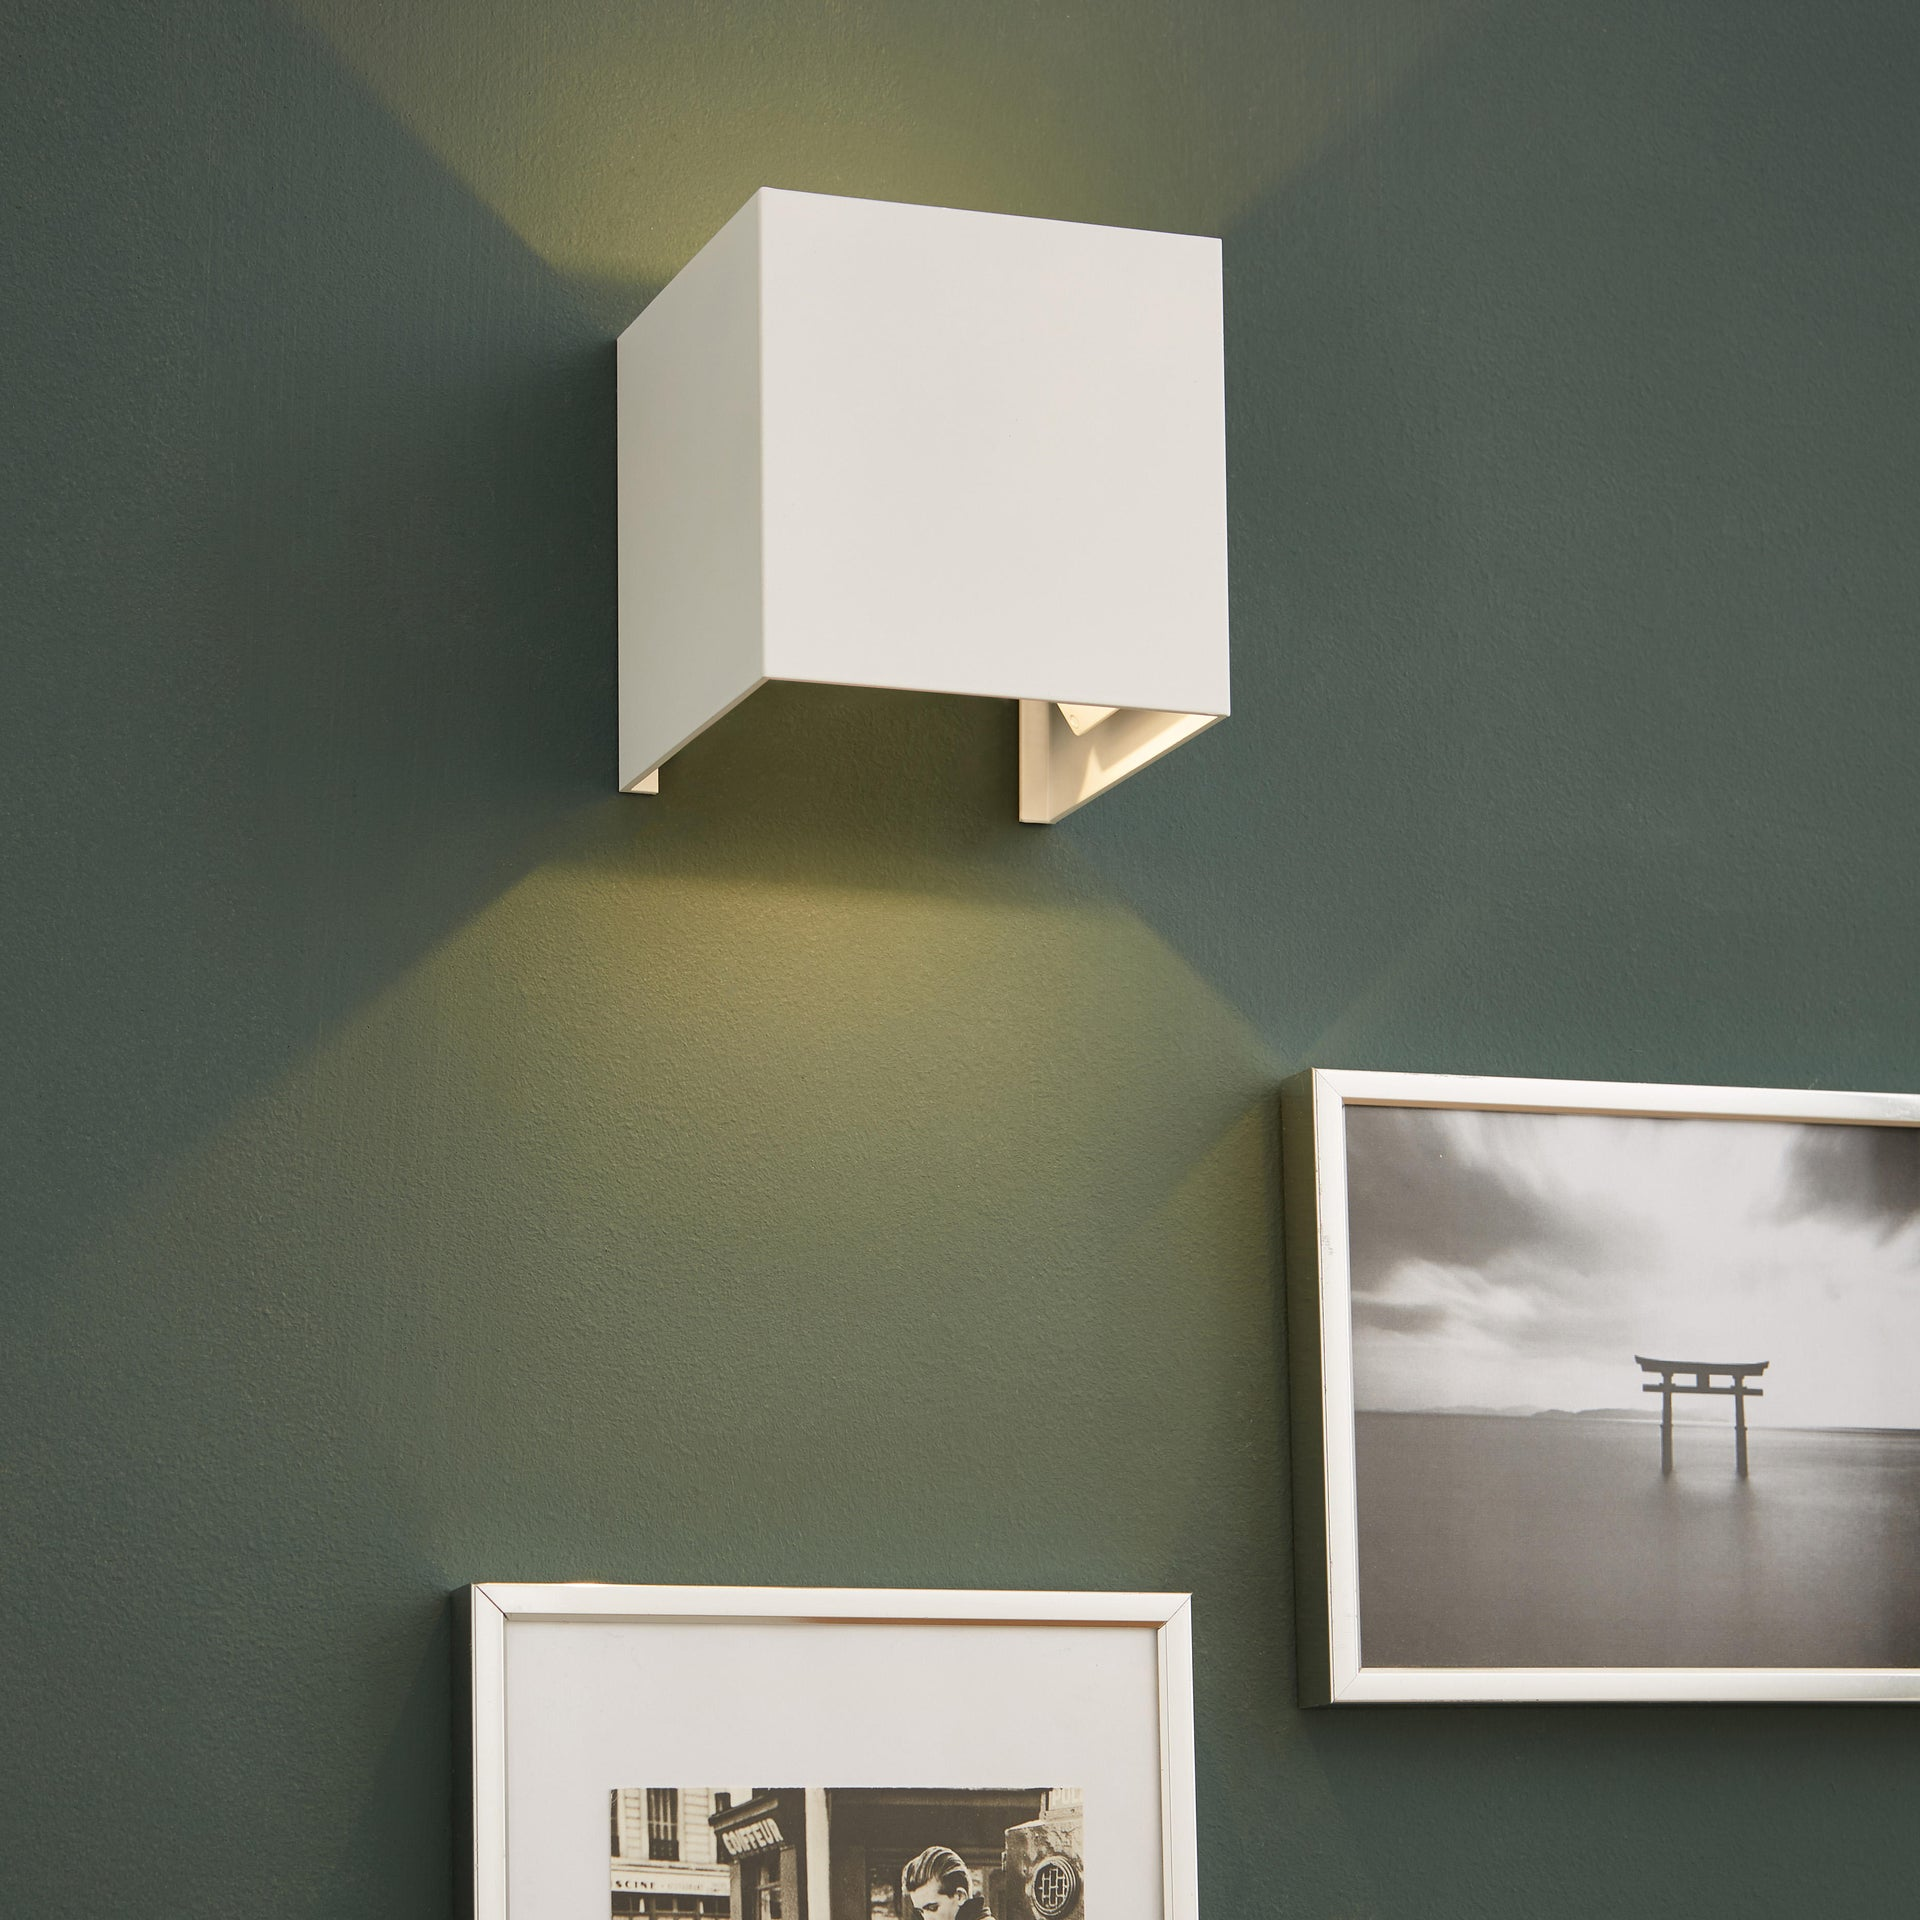 Applique design Kubbo LED integrato bianco, in alluminio, D. 10.0 cm 10.0x10.0 cm, INSPIRE - 1